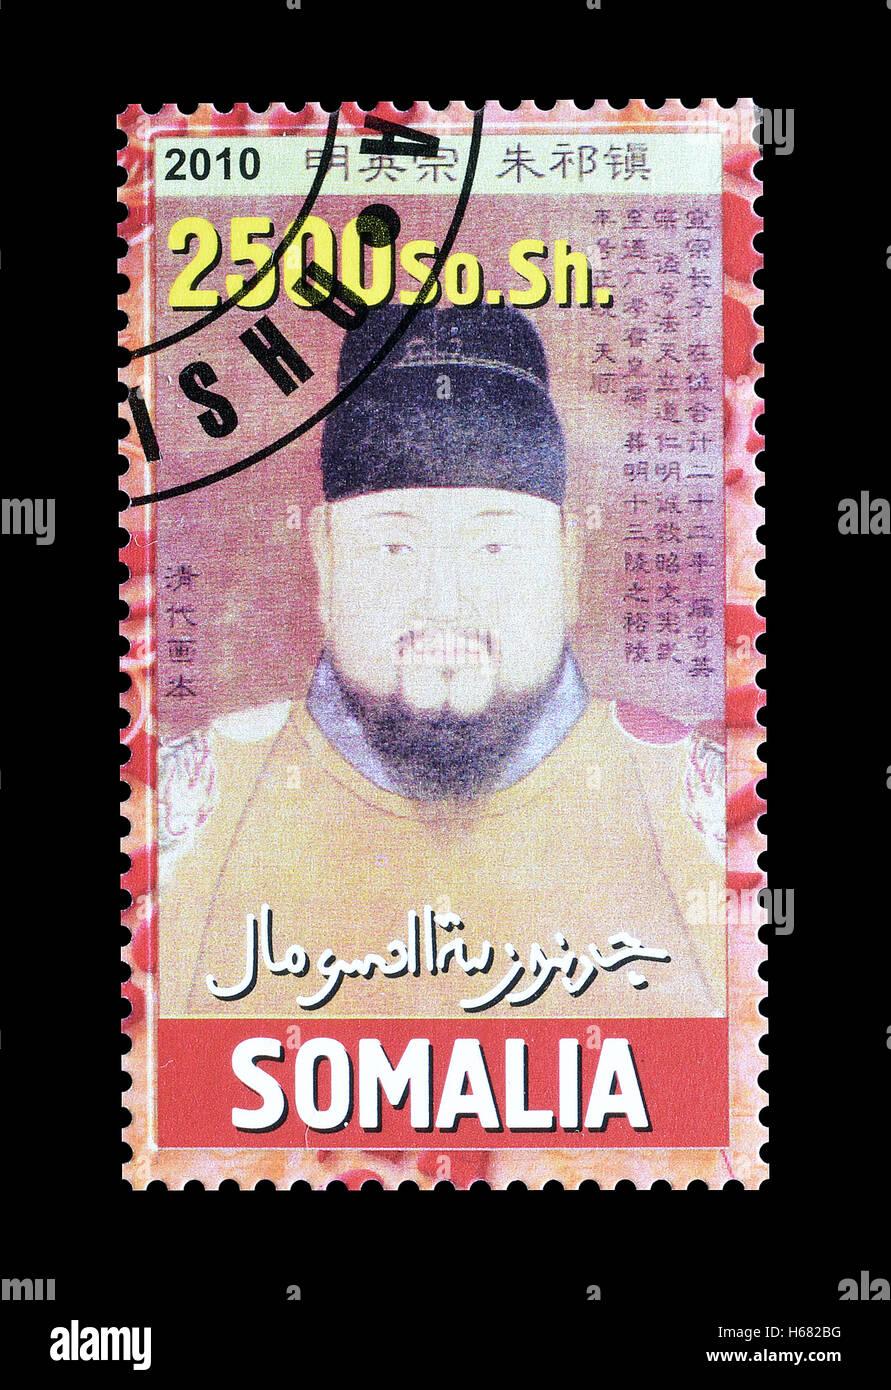 Somalia stamp 2010 - Stock Image